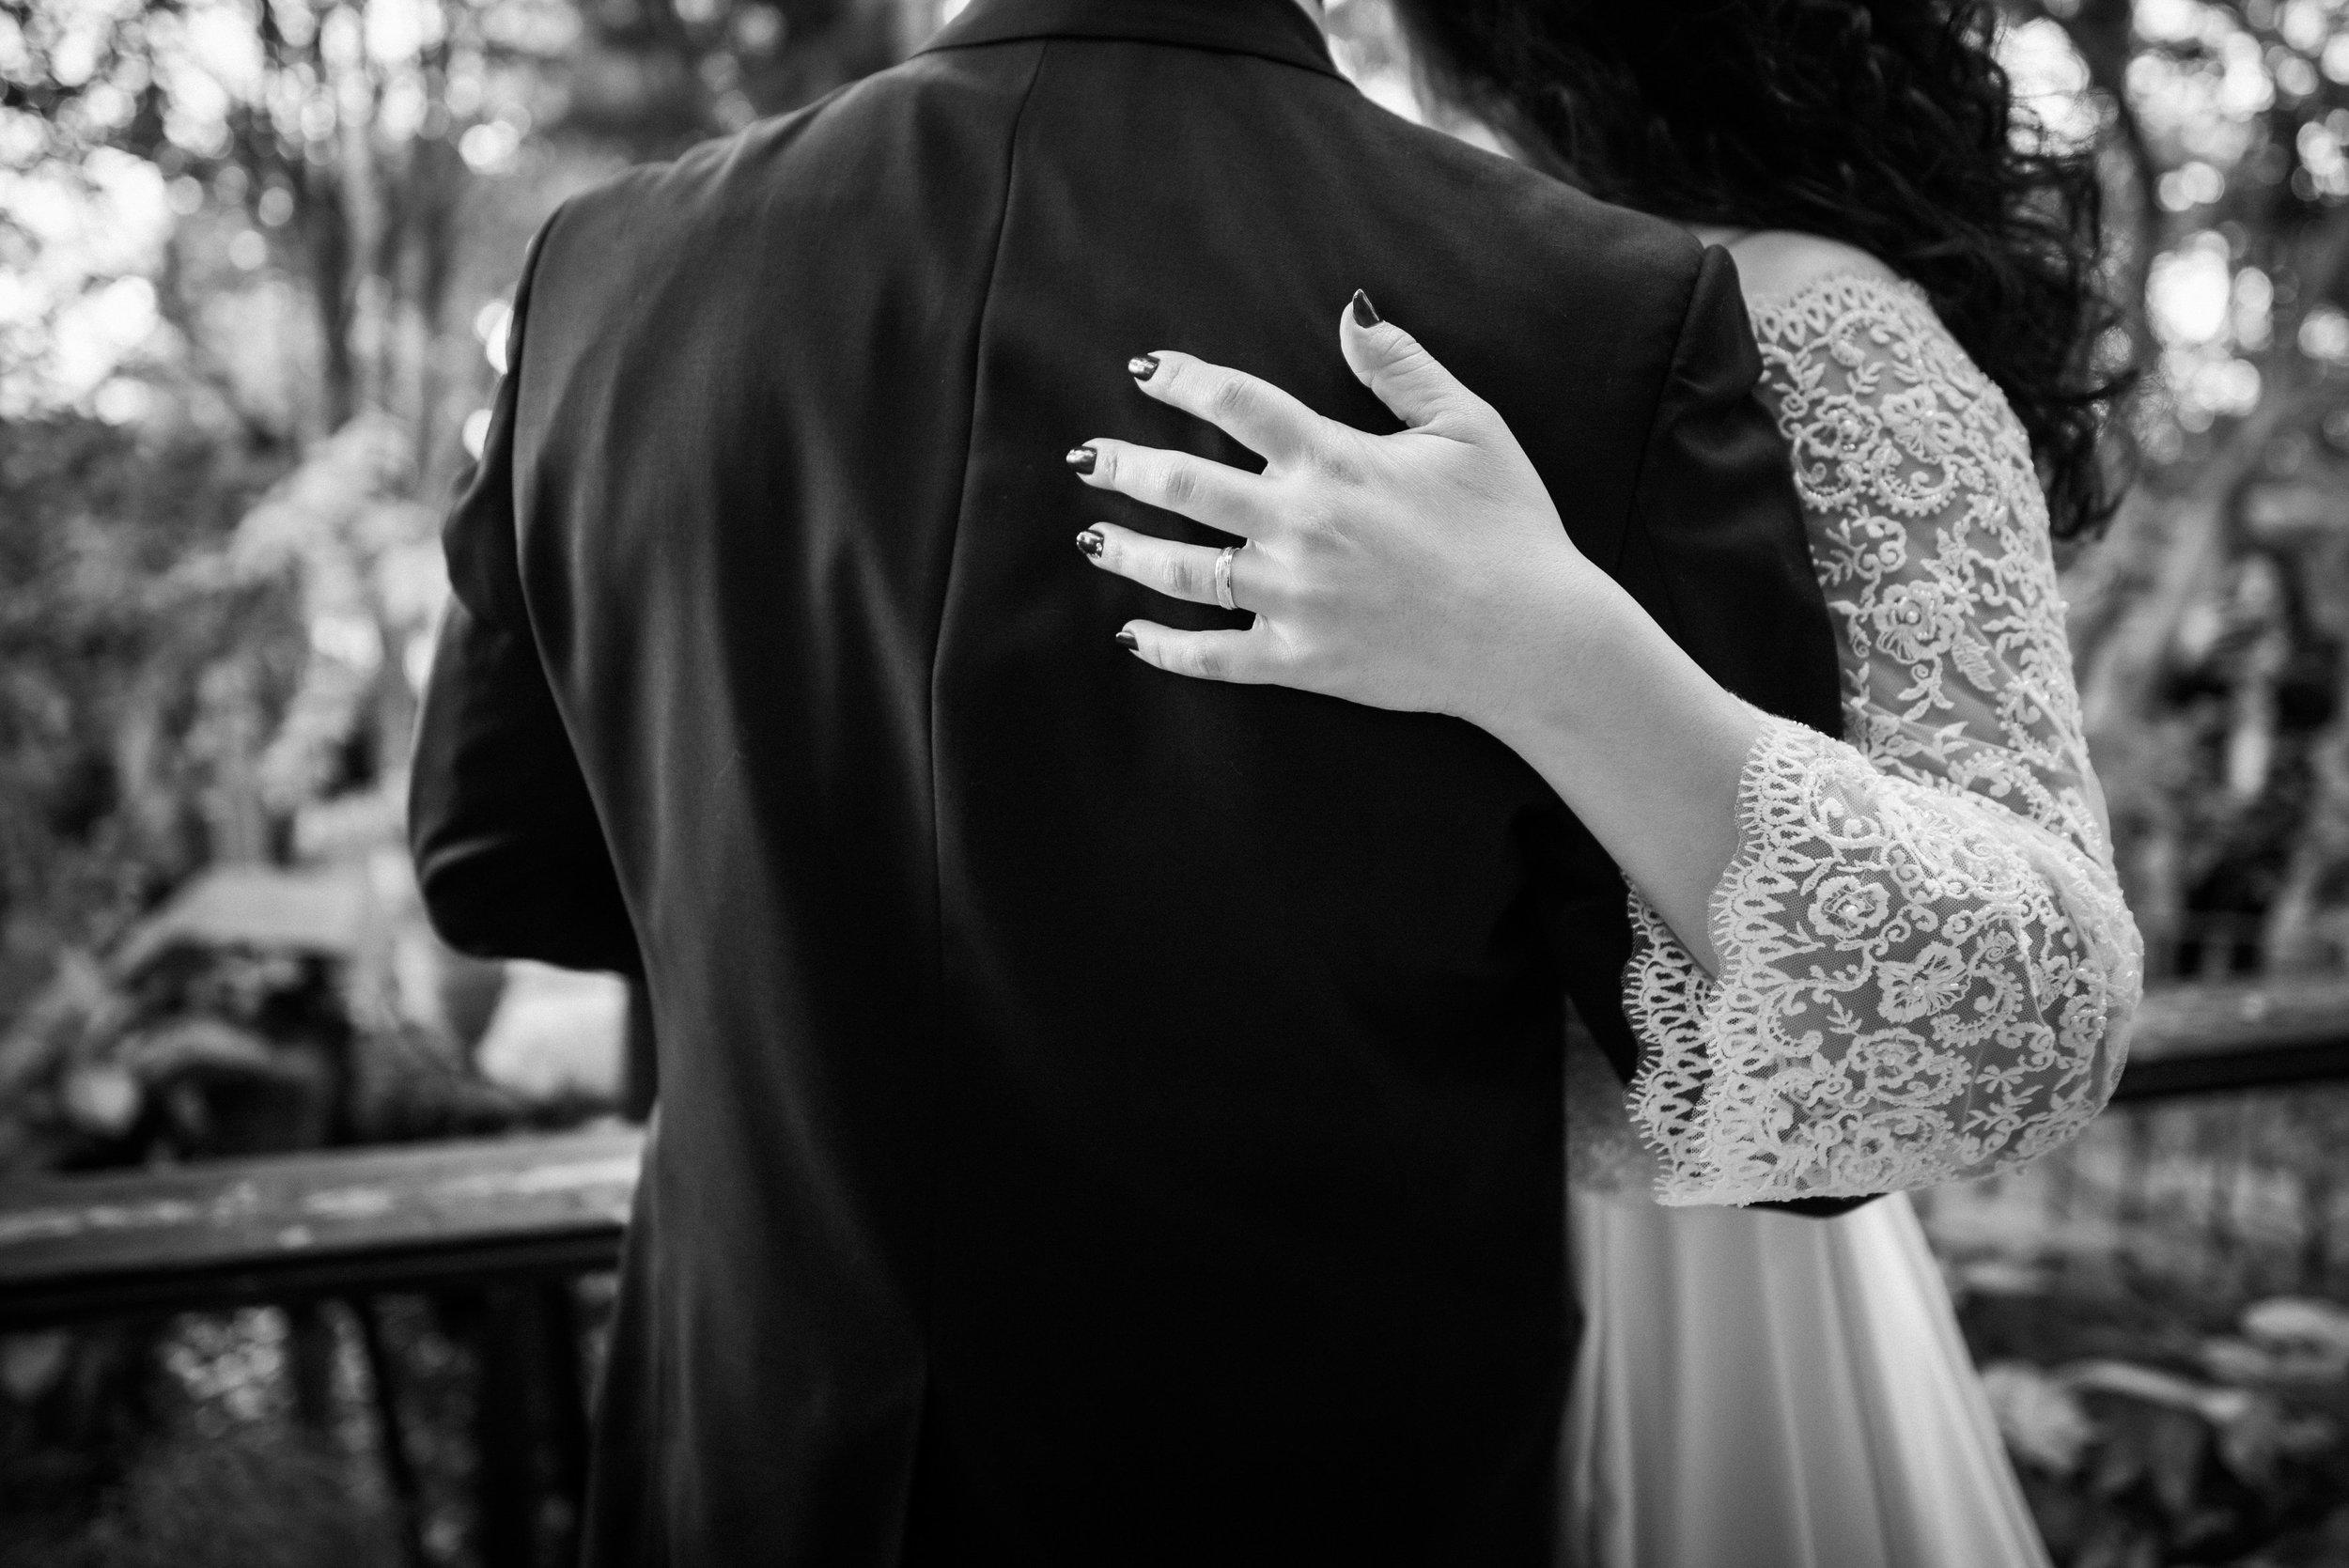 israel-garden-wedding-portraits-session-kate-giryes-photography--16_WEB.jpg